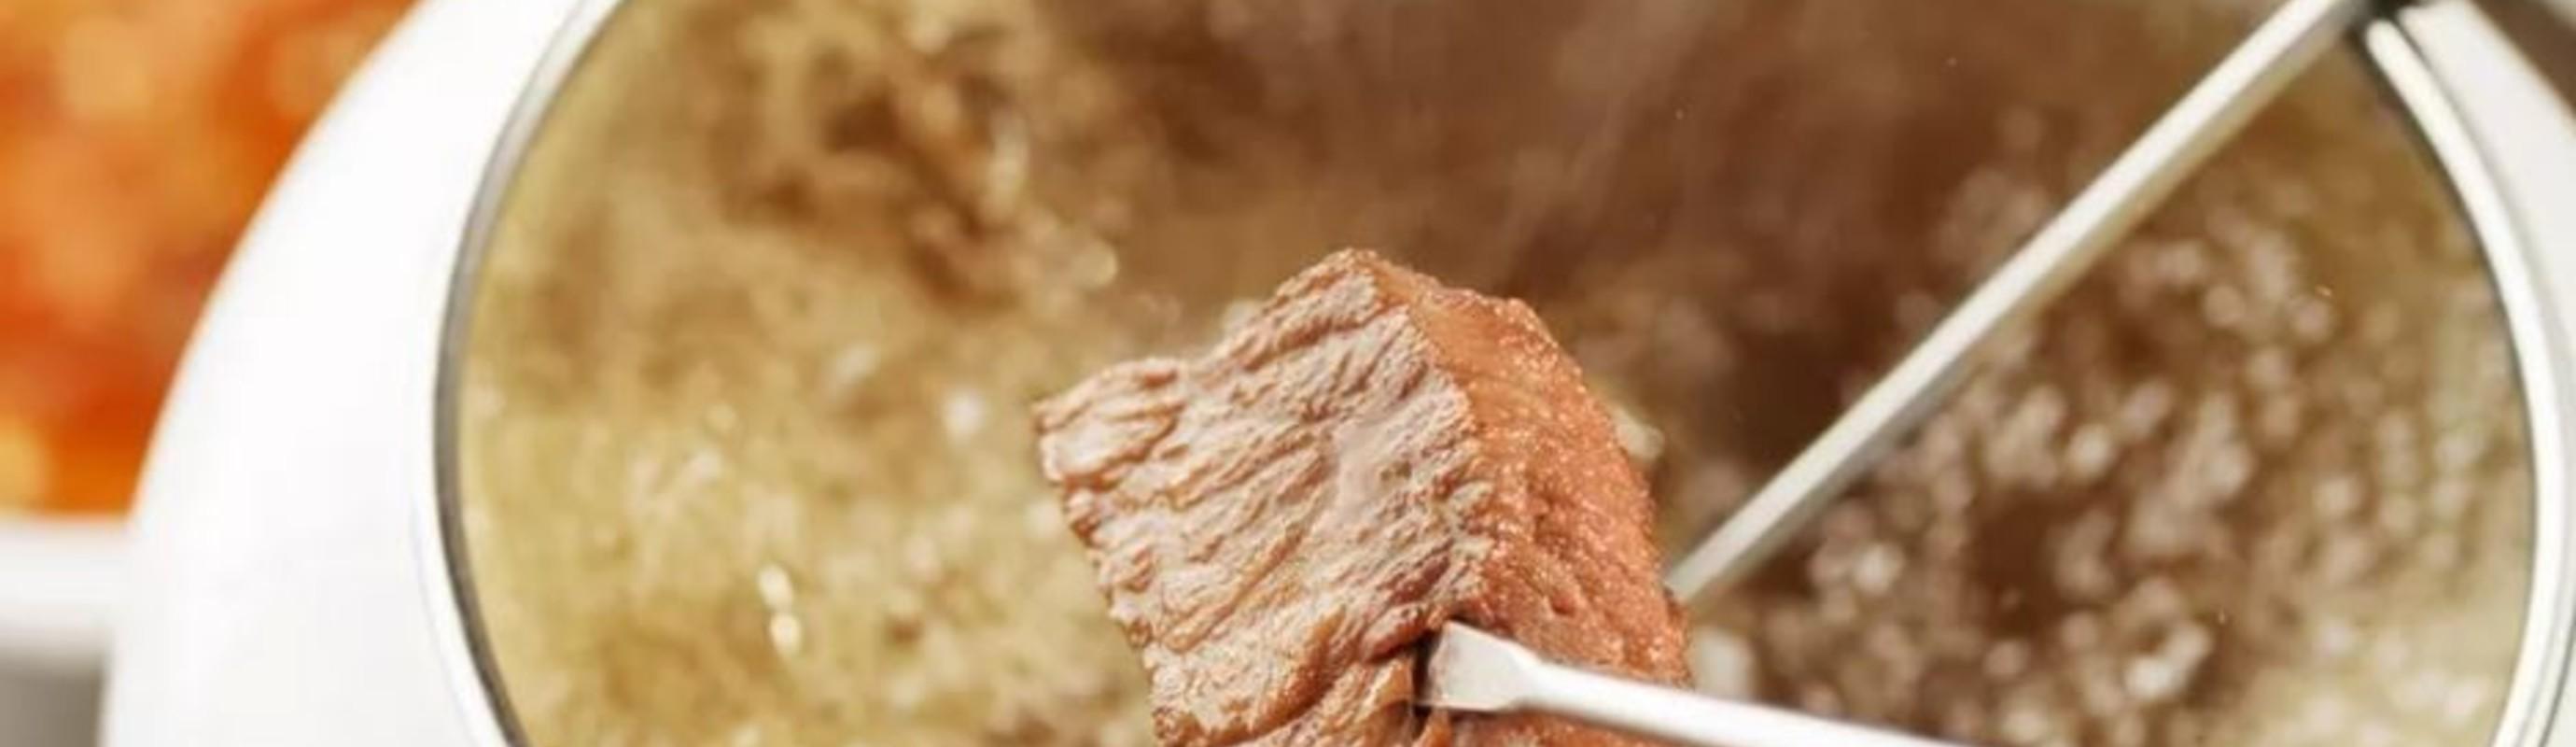 German Meat Fondue With Broth (Fleischfondue)